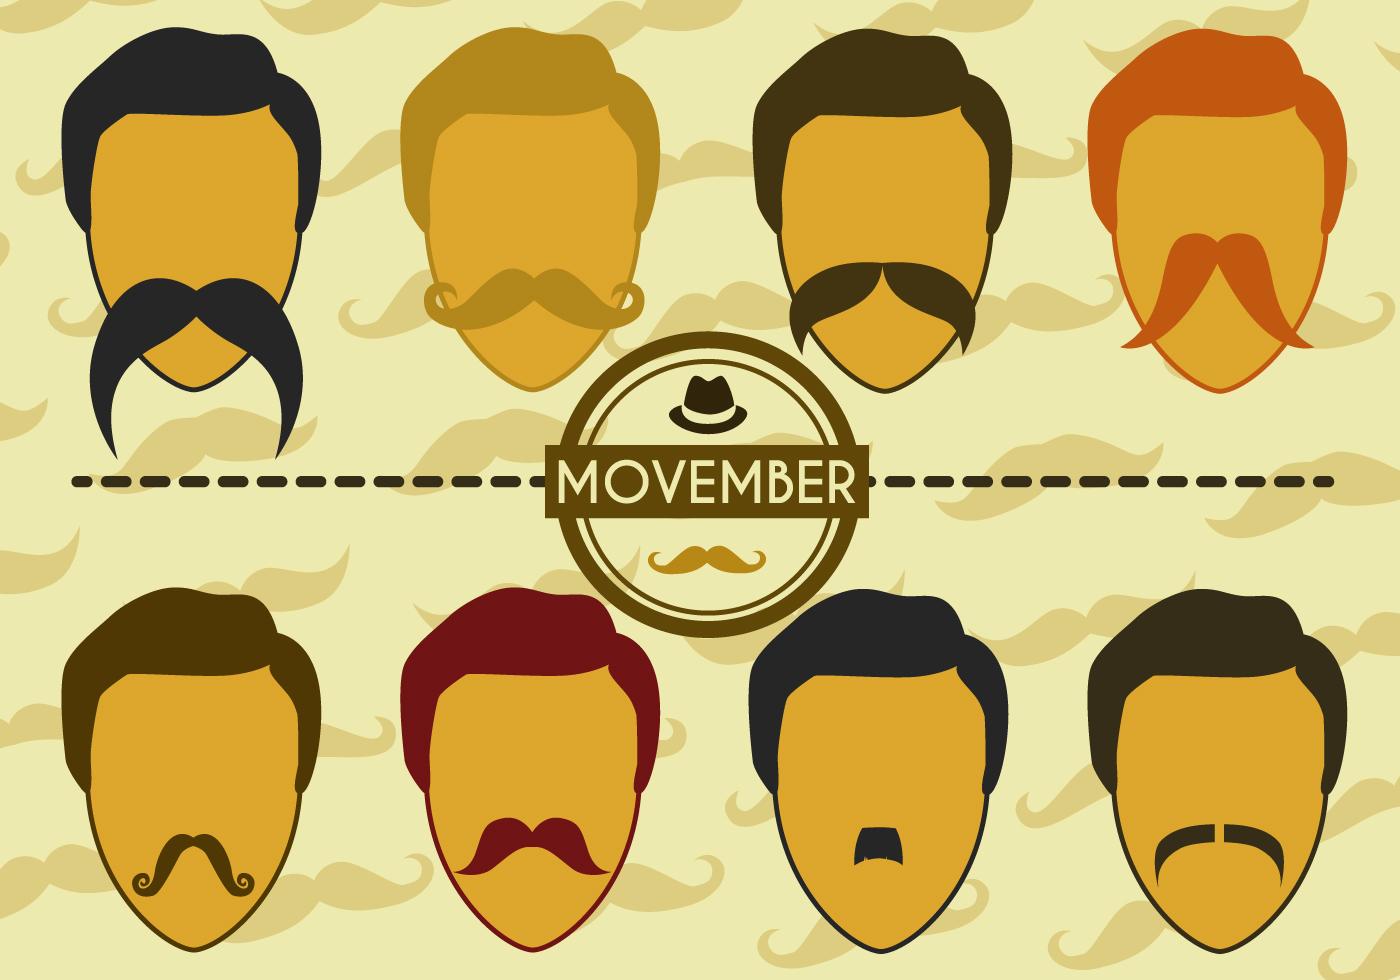 Free Movember Vector Download Free Vector Art Stock